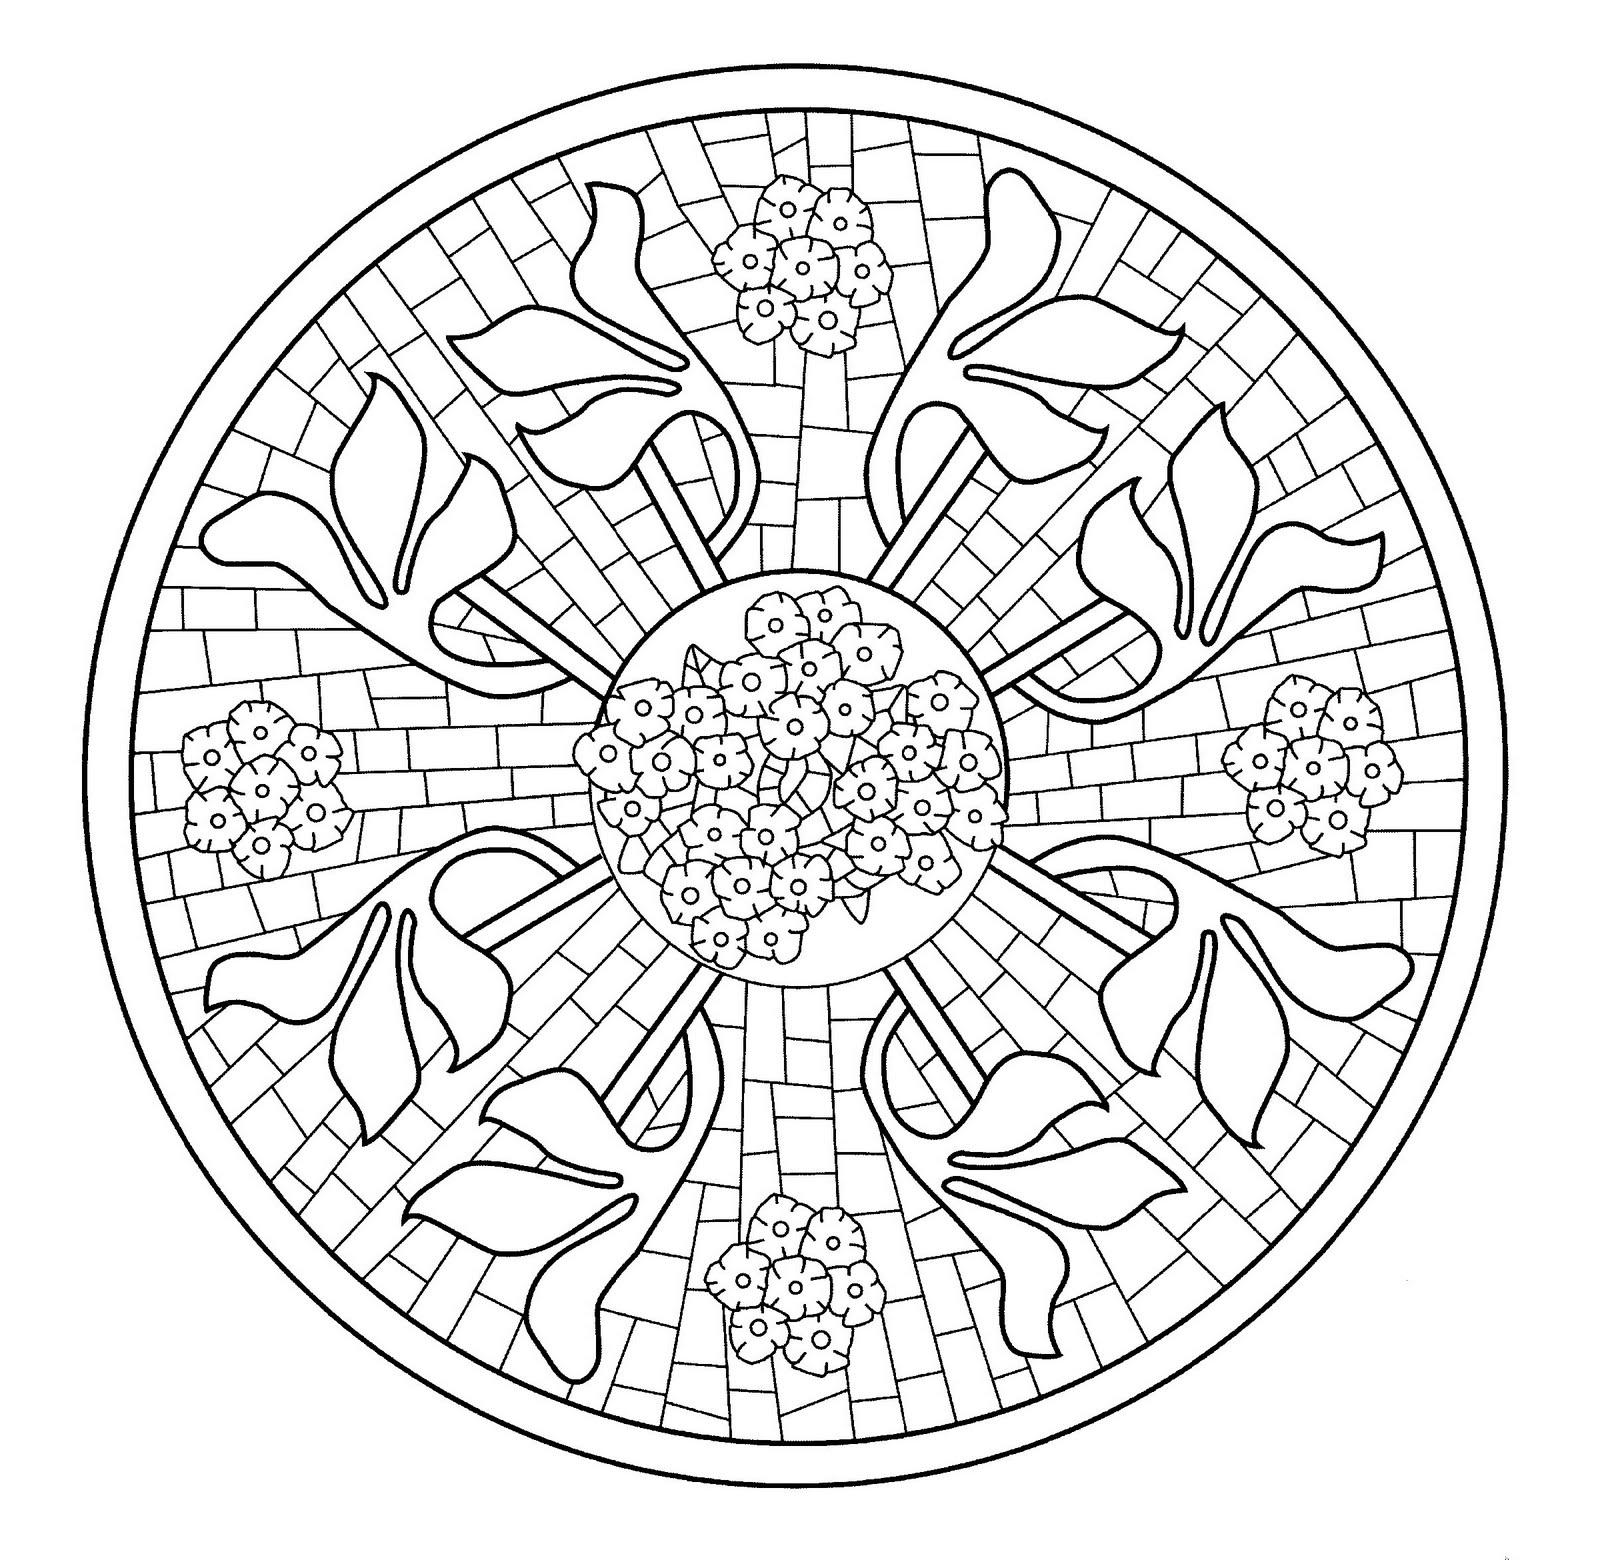 Dibujos para colorear de Mandala Mosaico con flores